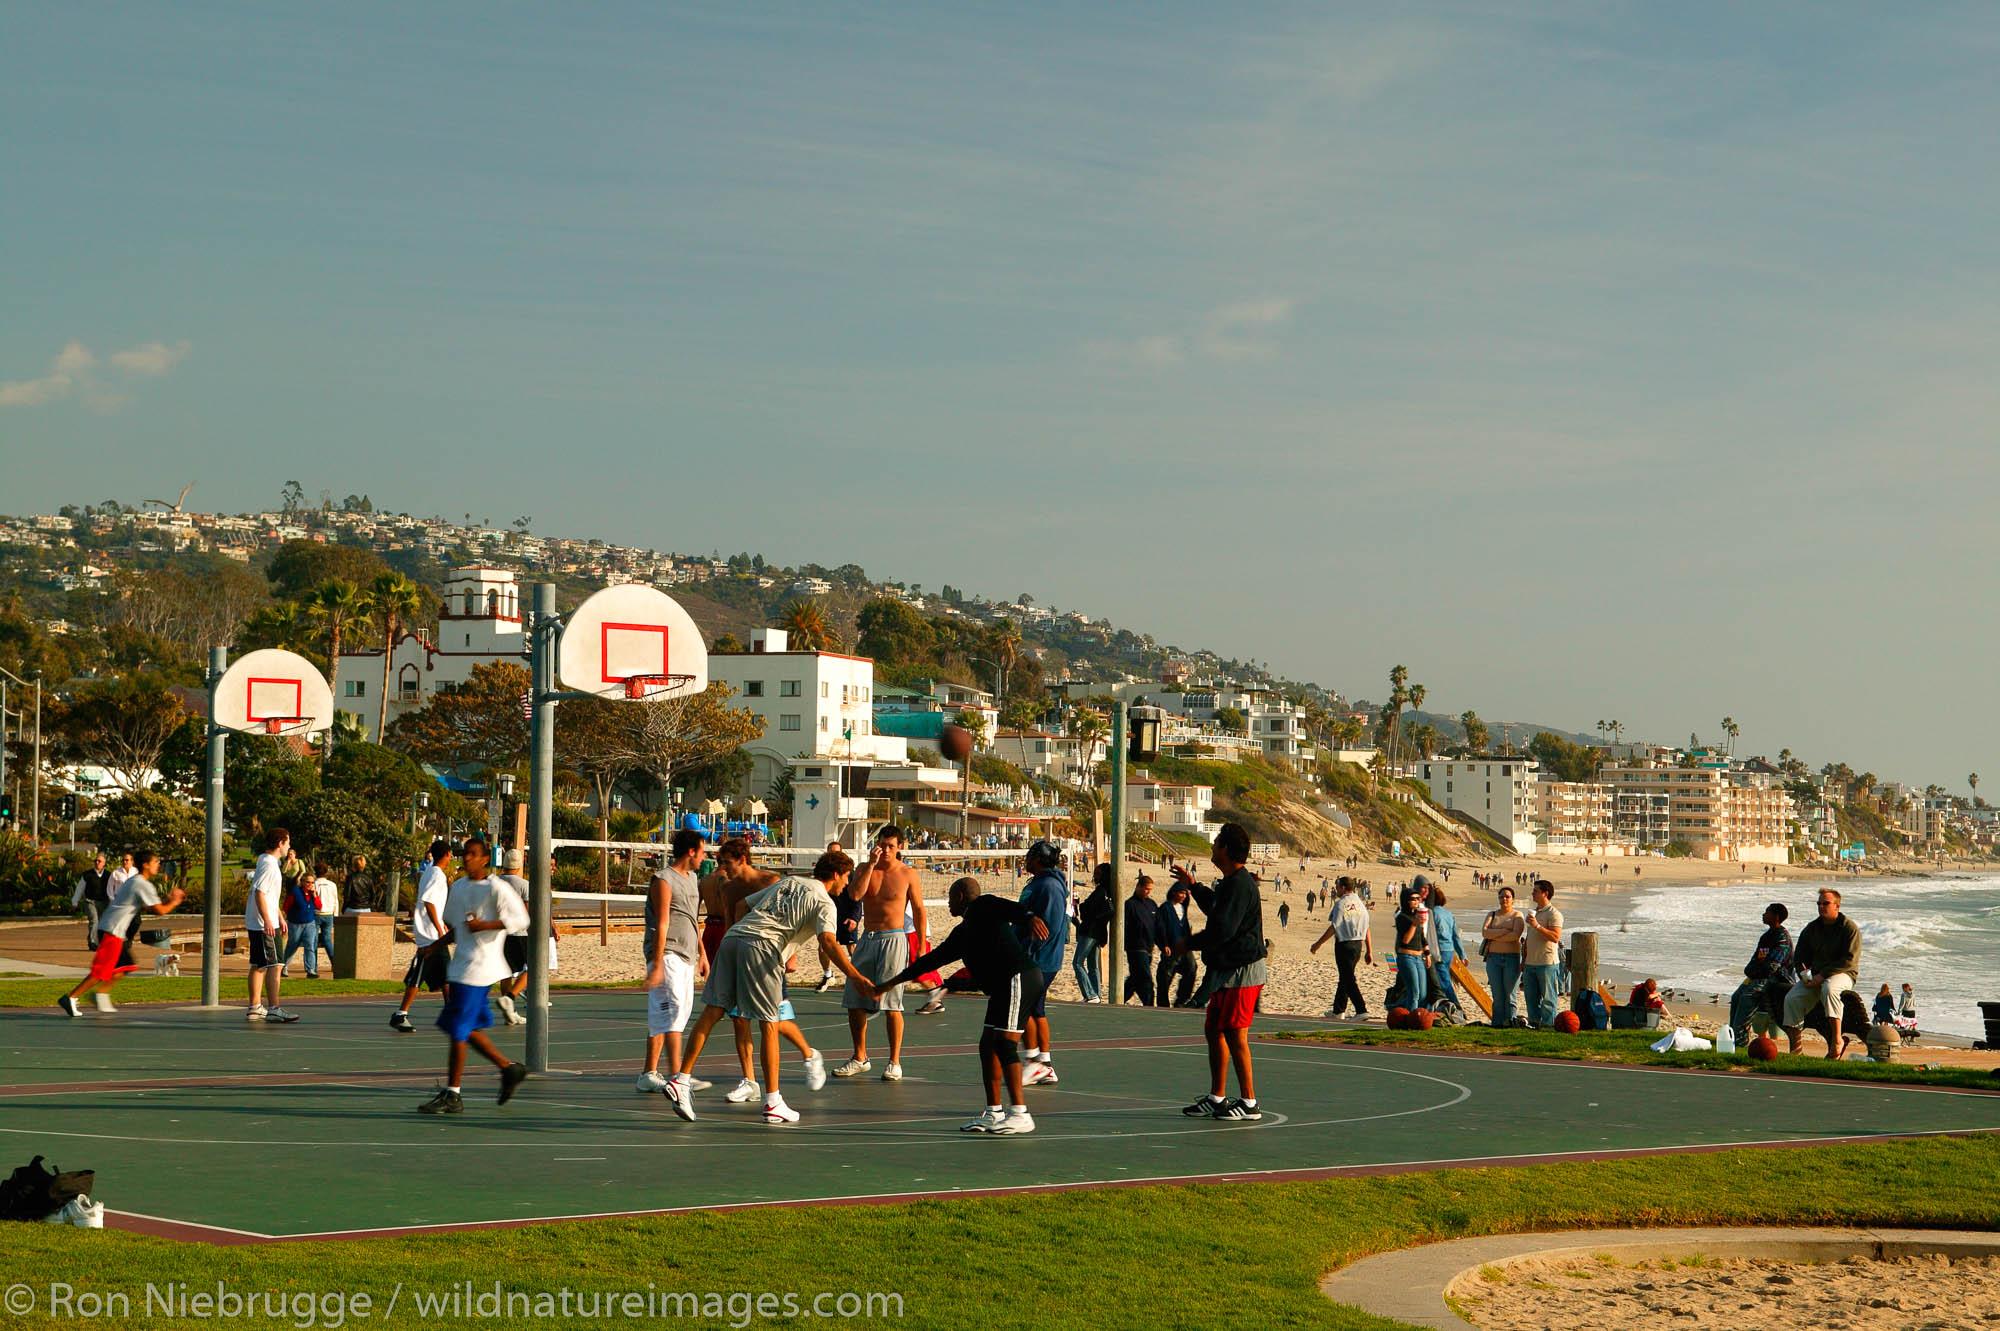 Basketball courts, Laguna Beach, California.